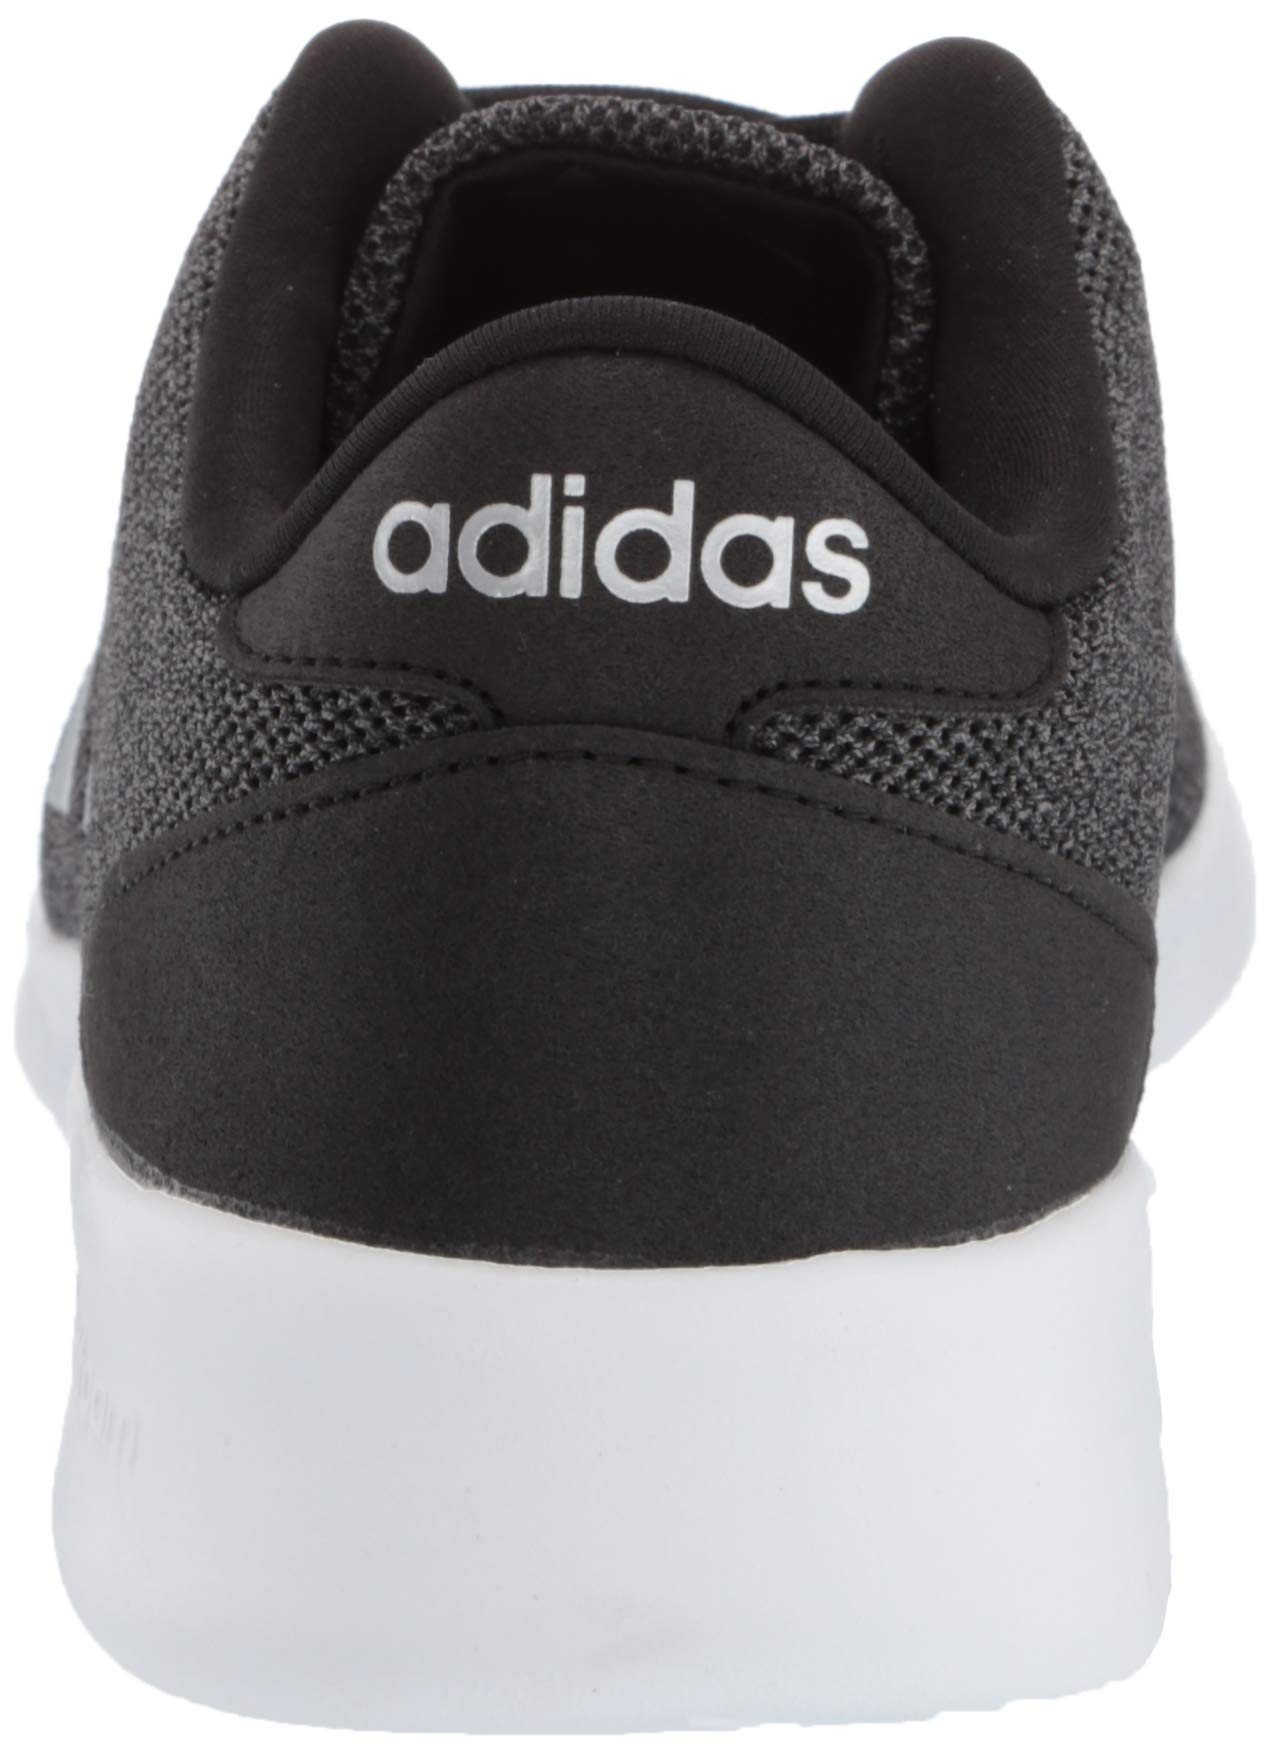 adidas Women's Cloudfoam Qt Racer Sneaker, Black/Silver Metallic/Grey, 5.5 M US by adidas (Image #2)